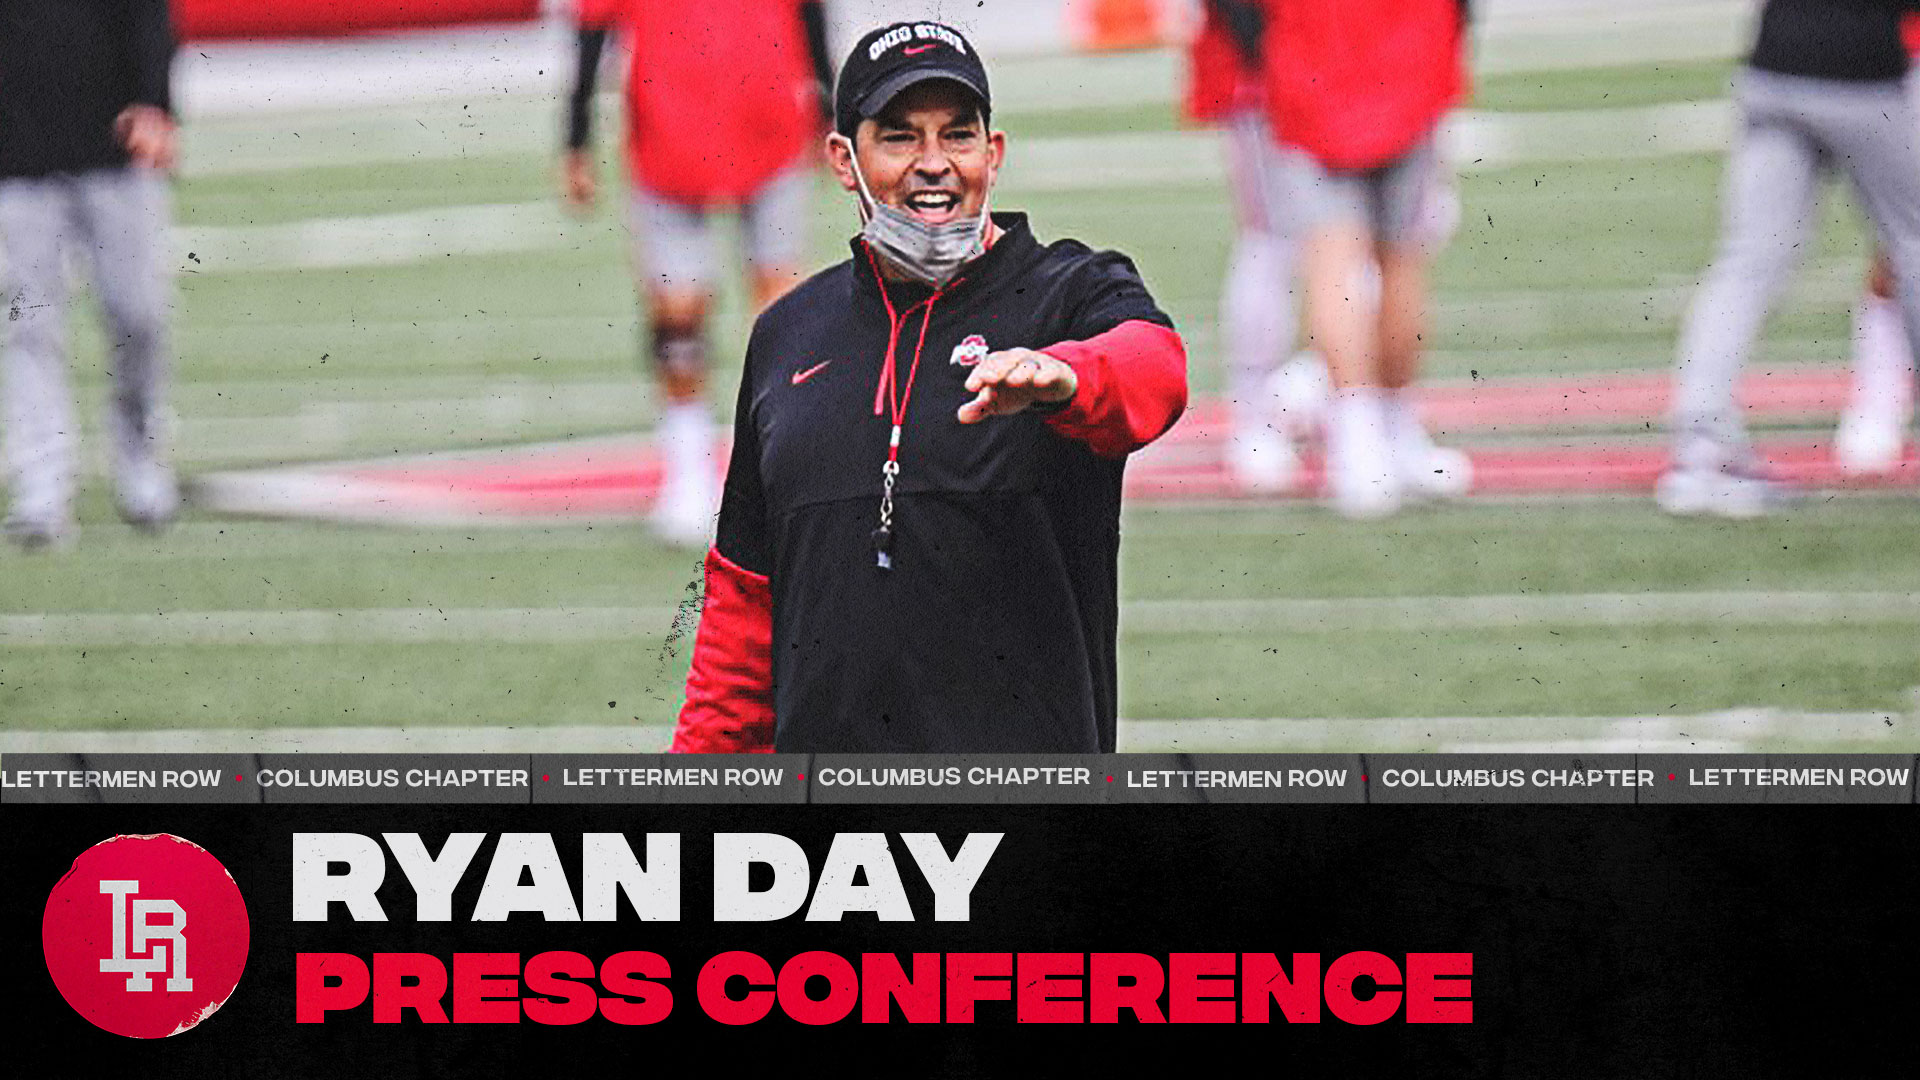 Ryan-Day-Press-Conference-after-nebraska-revised